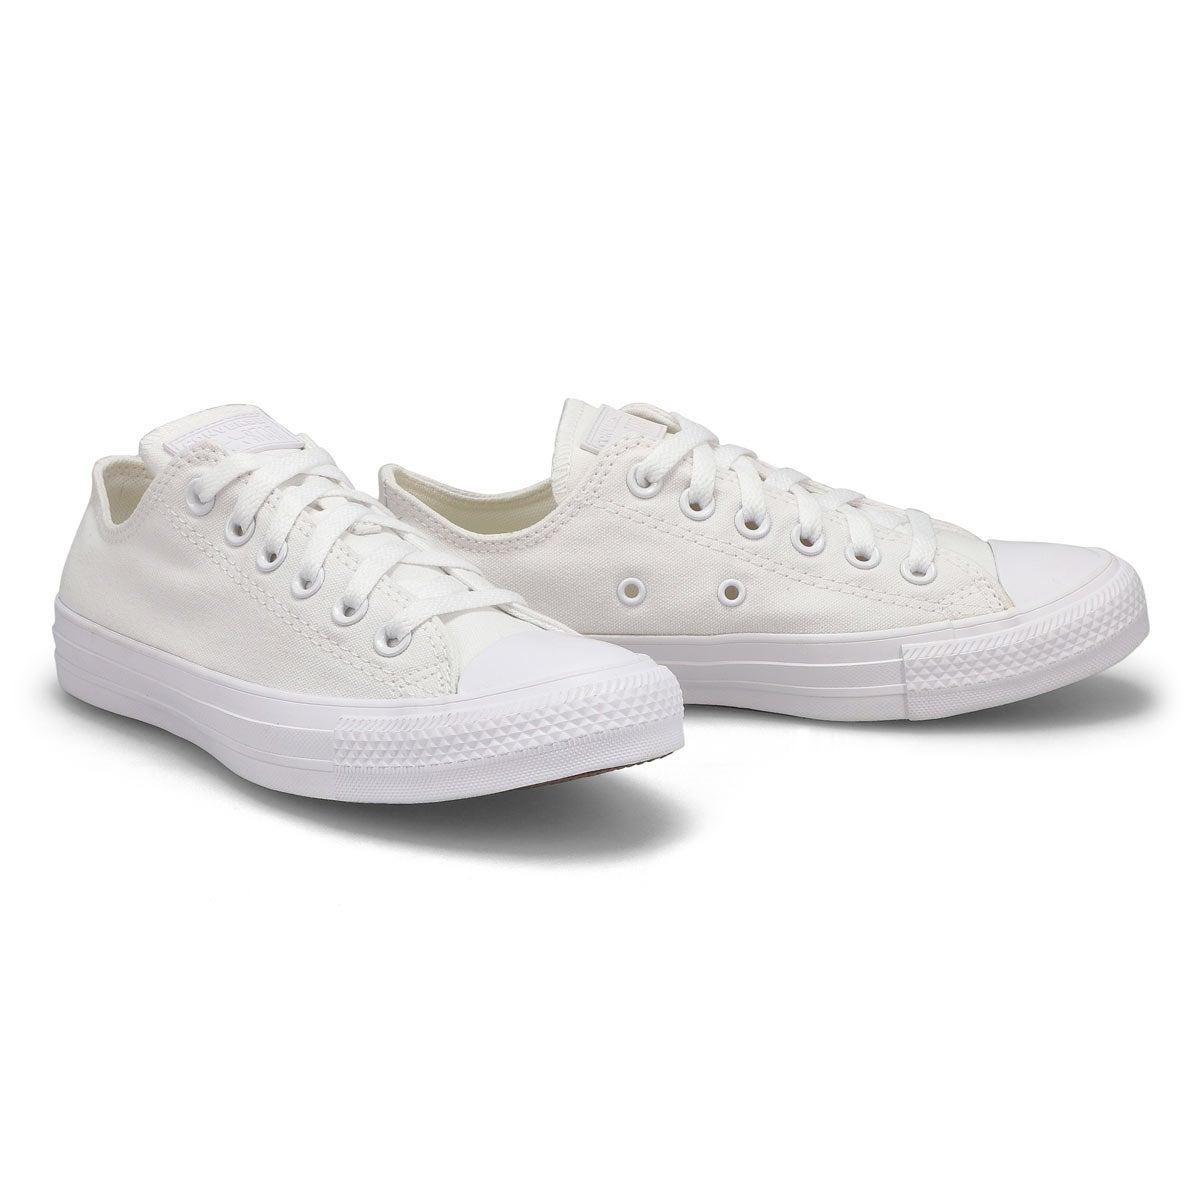 Women's Chuck Taylor All Star Sneakers - Wht/Mono